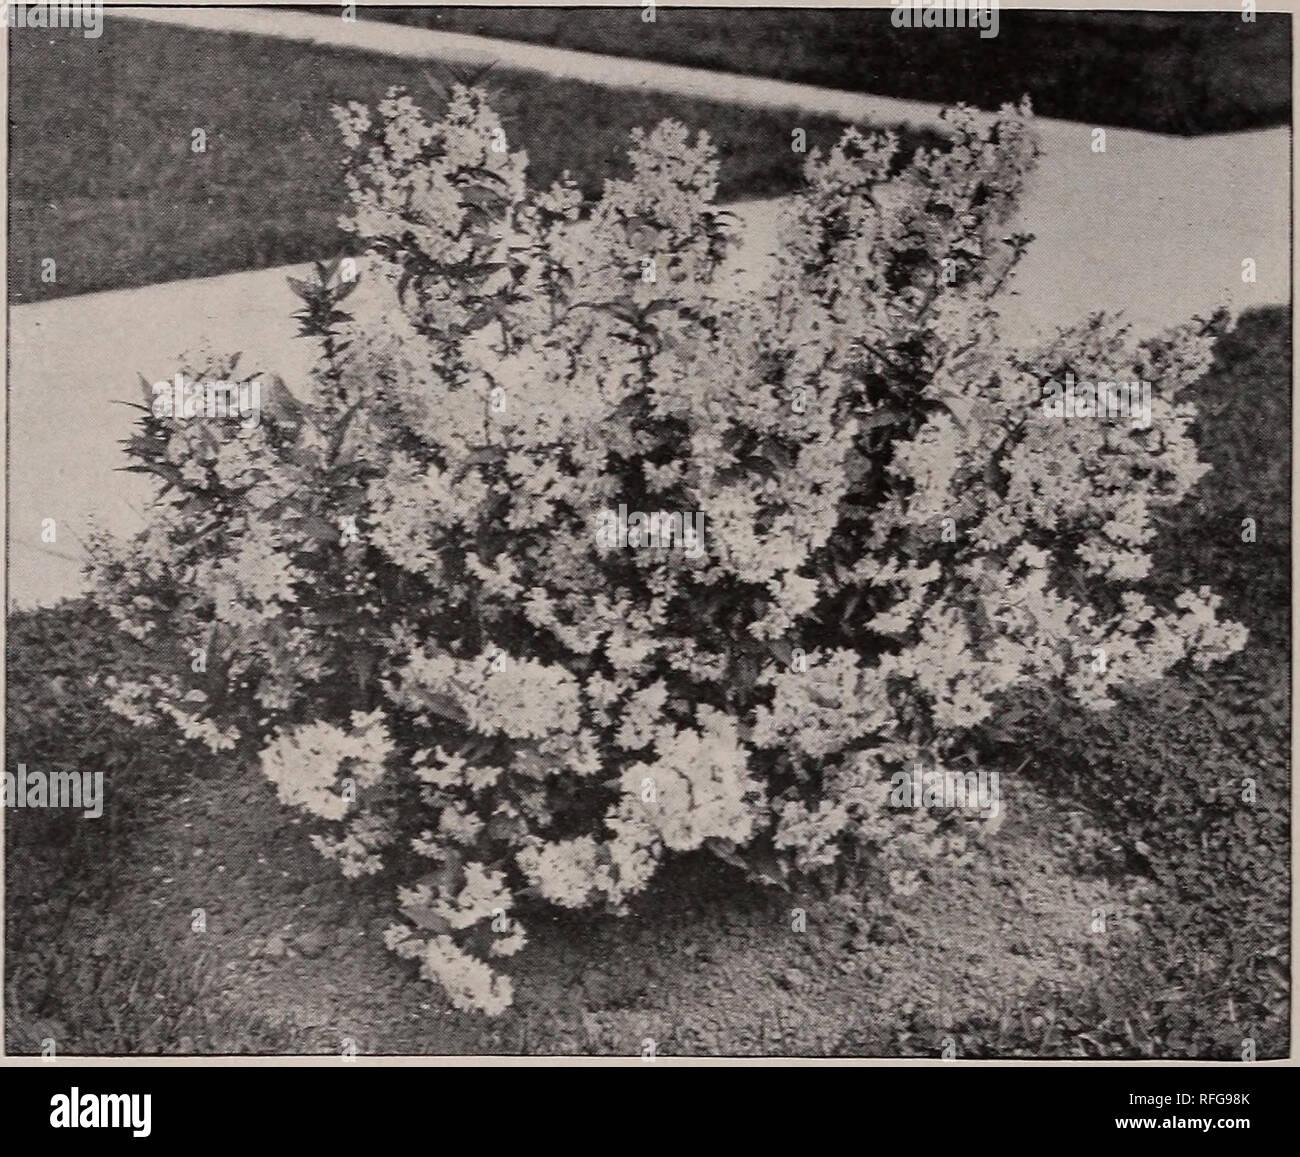 Zirngiebels New Giant Pansies Nursery Stock New York State